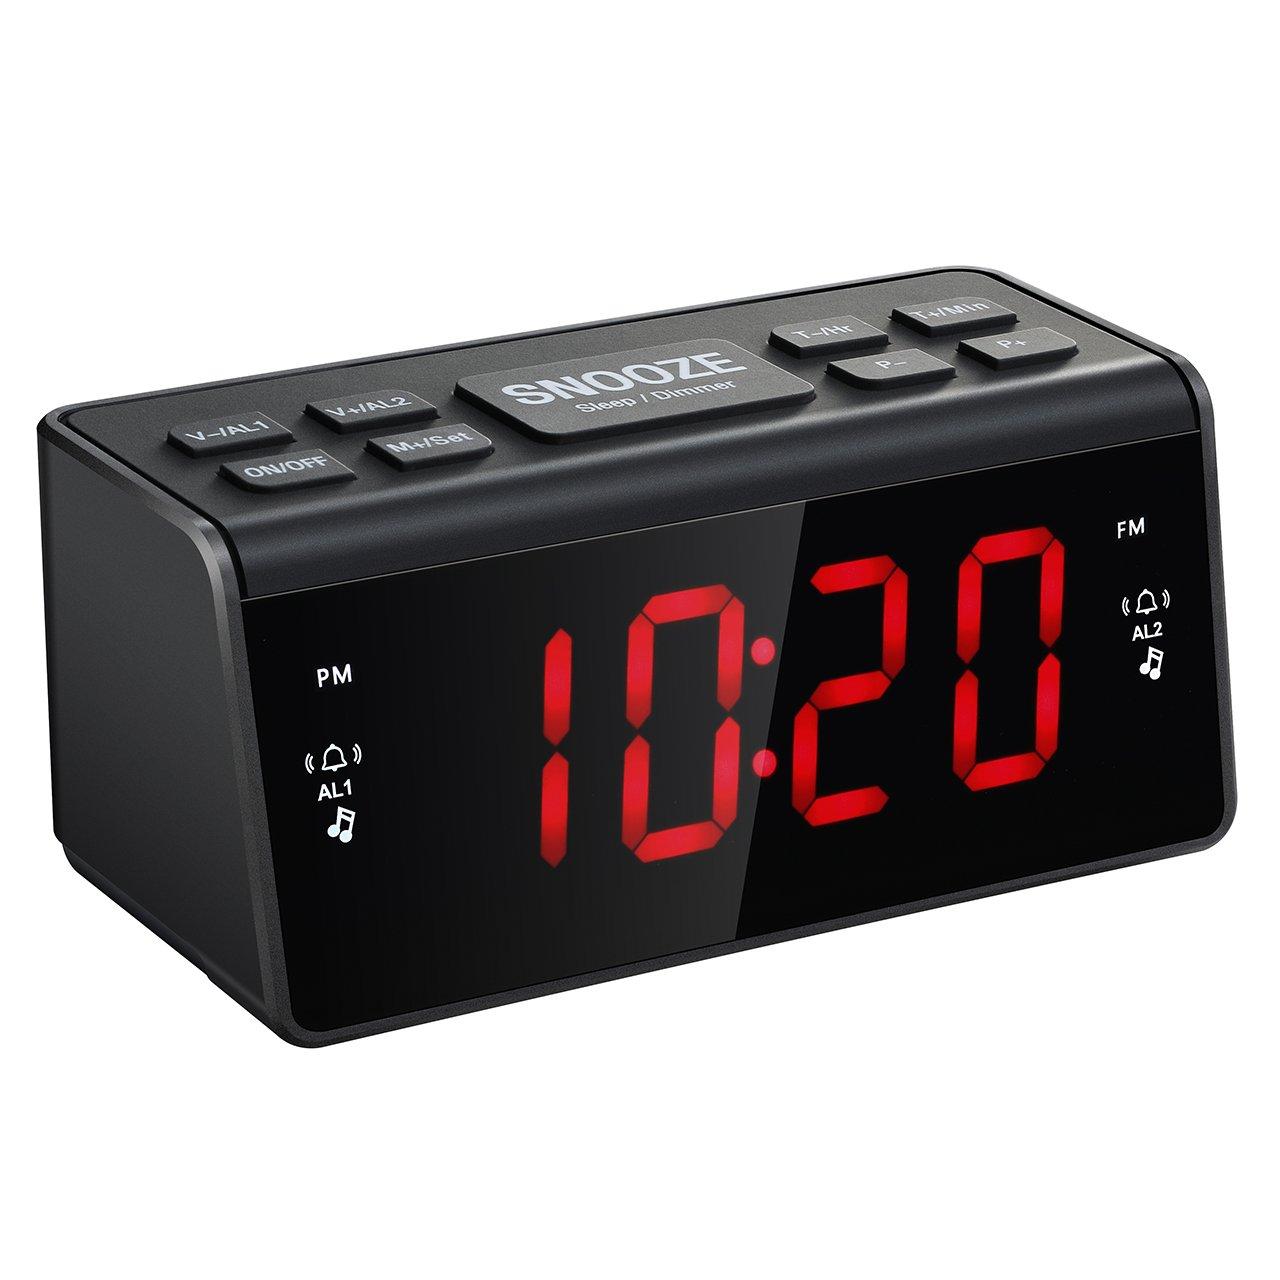 Mpow FM Radio Alarm Clock, FM/AM Digital Radio Clock Bedside Alarm Clocks  with Dual Alarms, Snooze Function, Sleep Timer, 1.5-inch Large Red LED  Display, ...